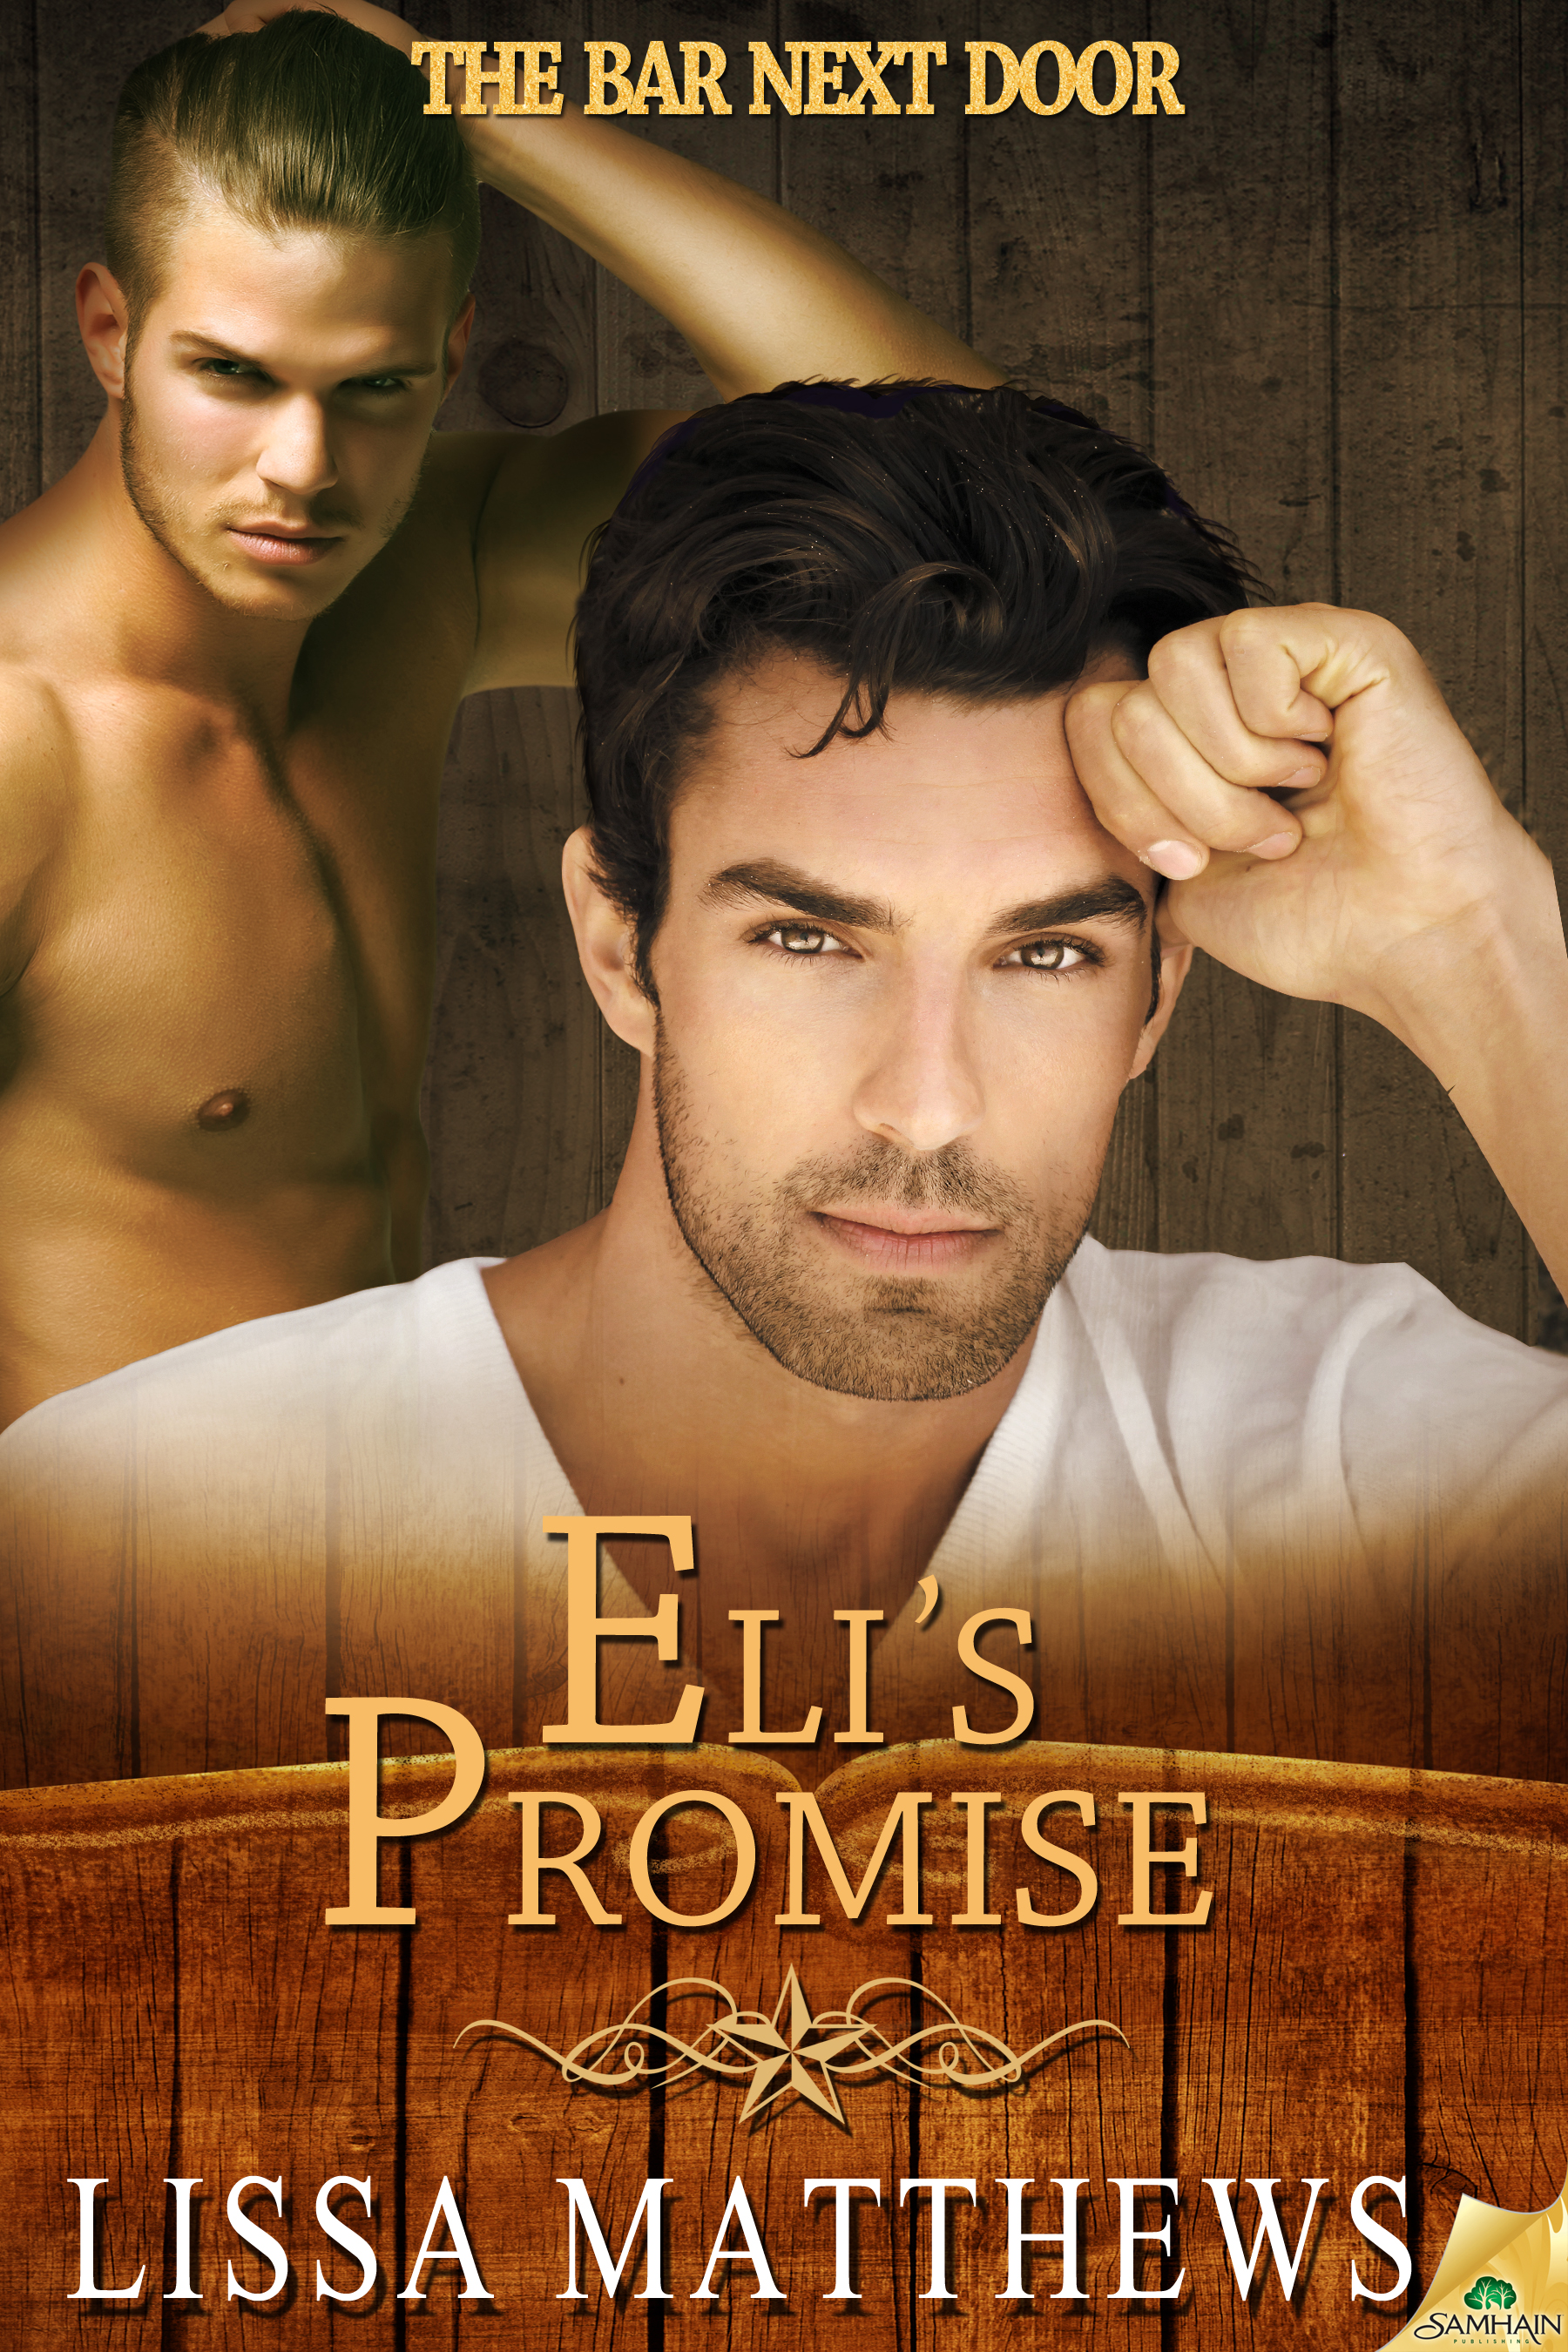 Elis Promise